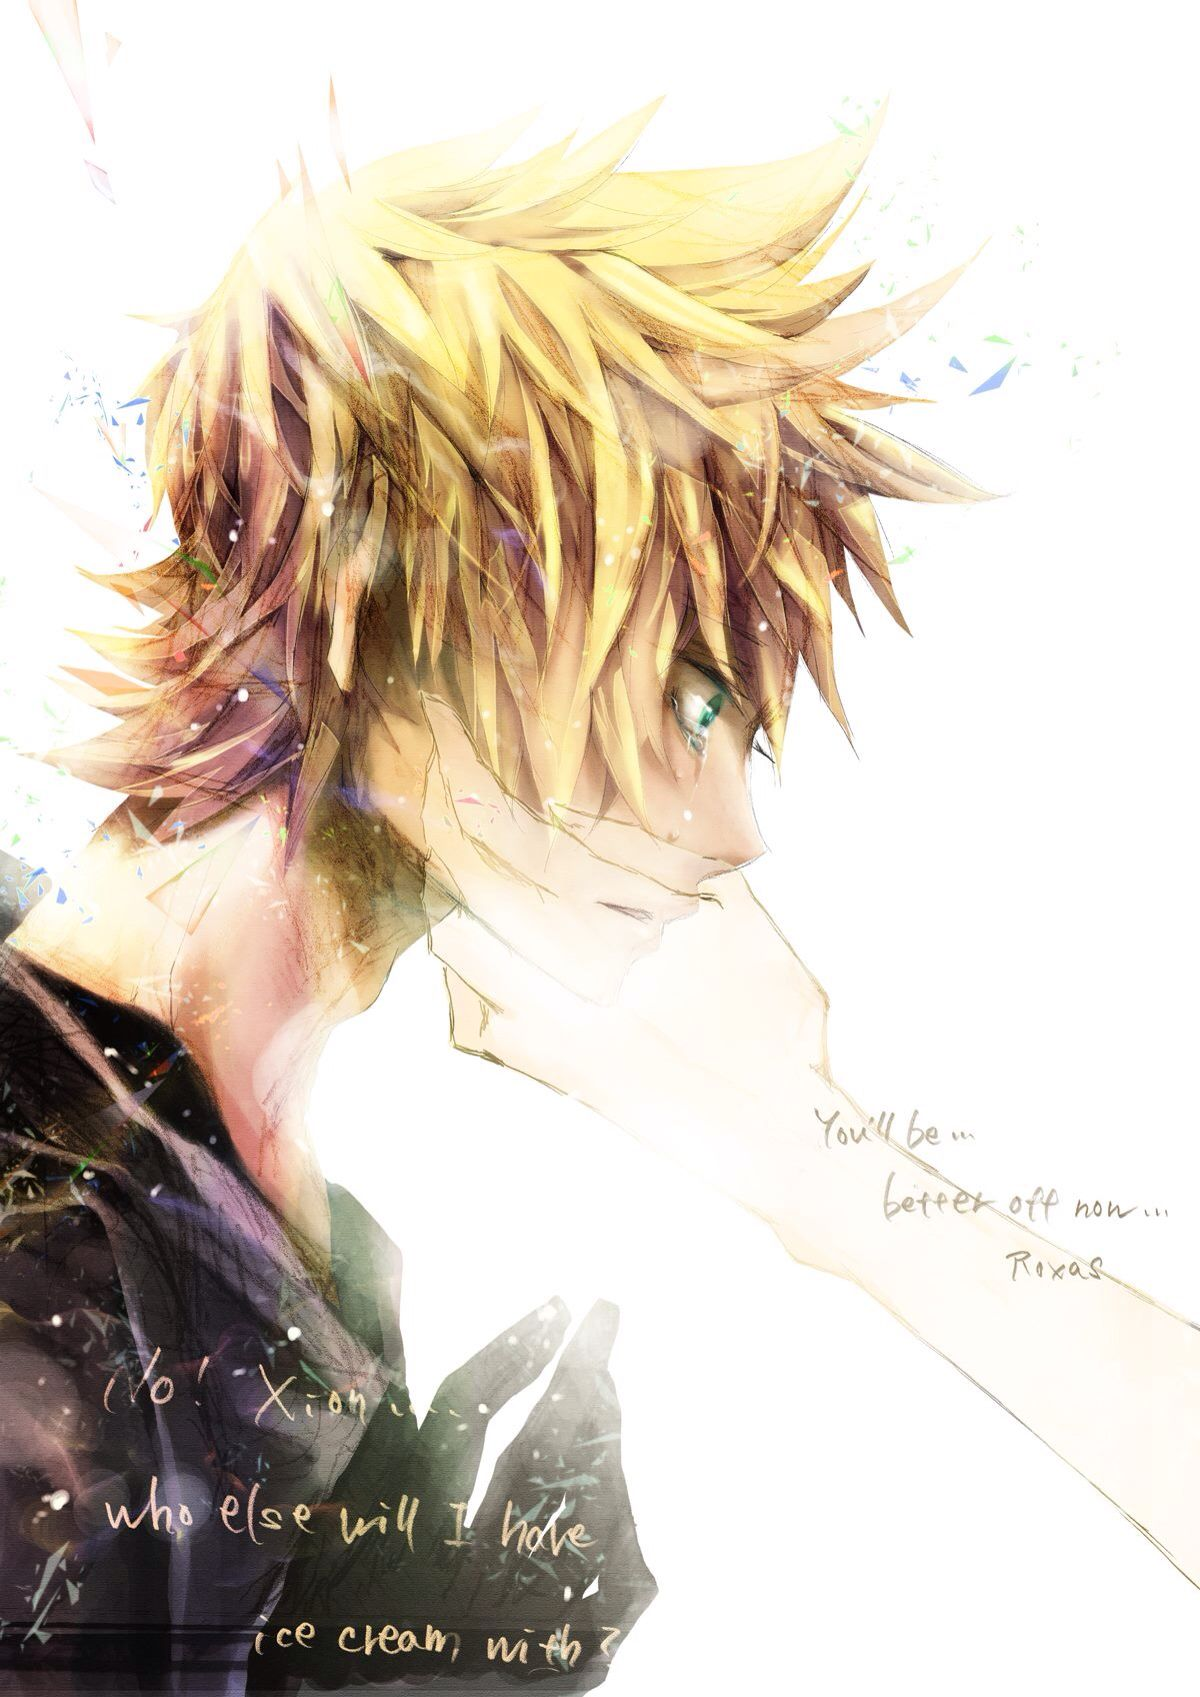 Anime boy crying!